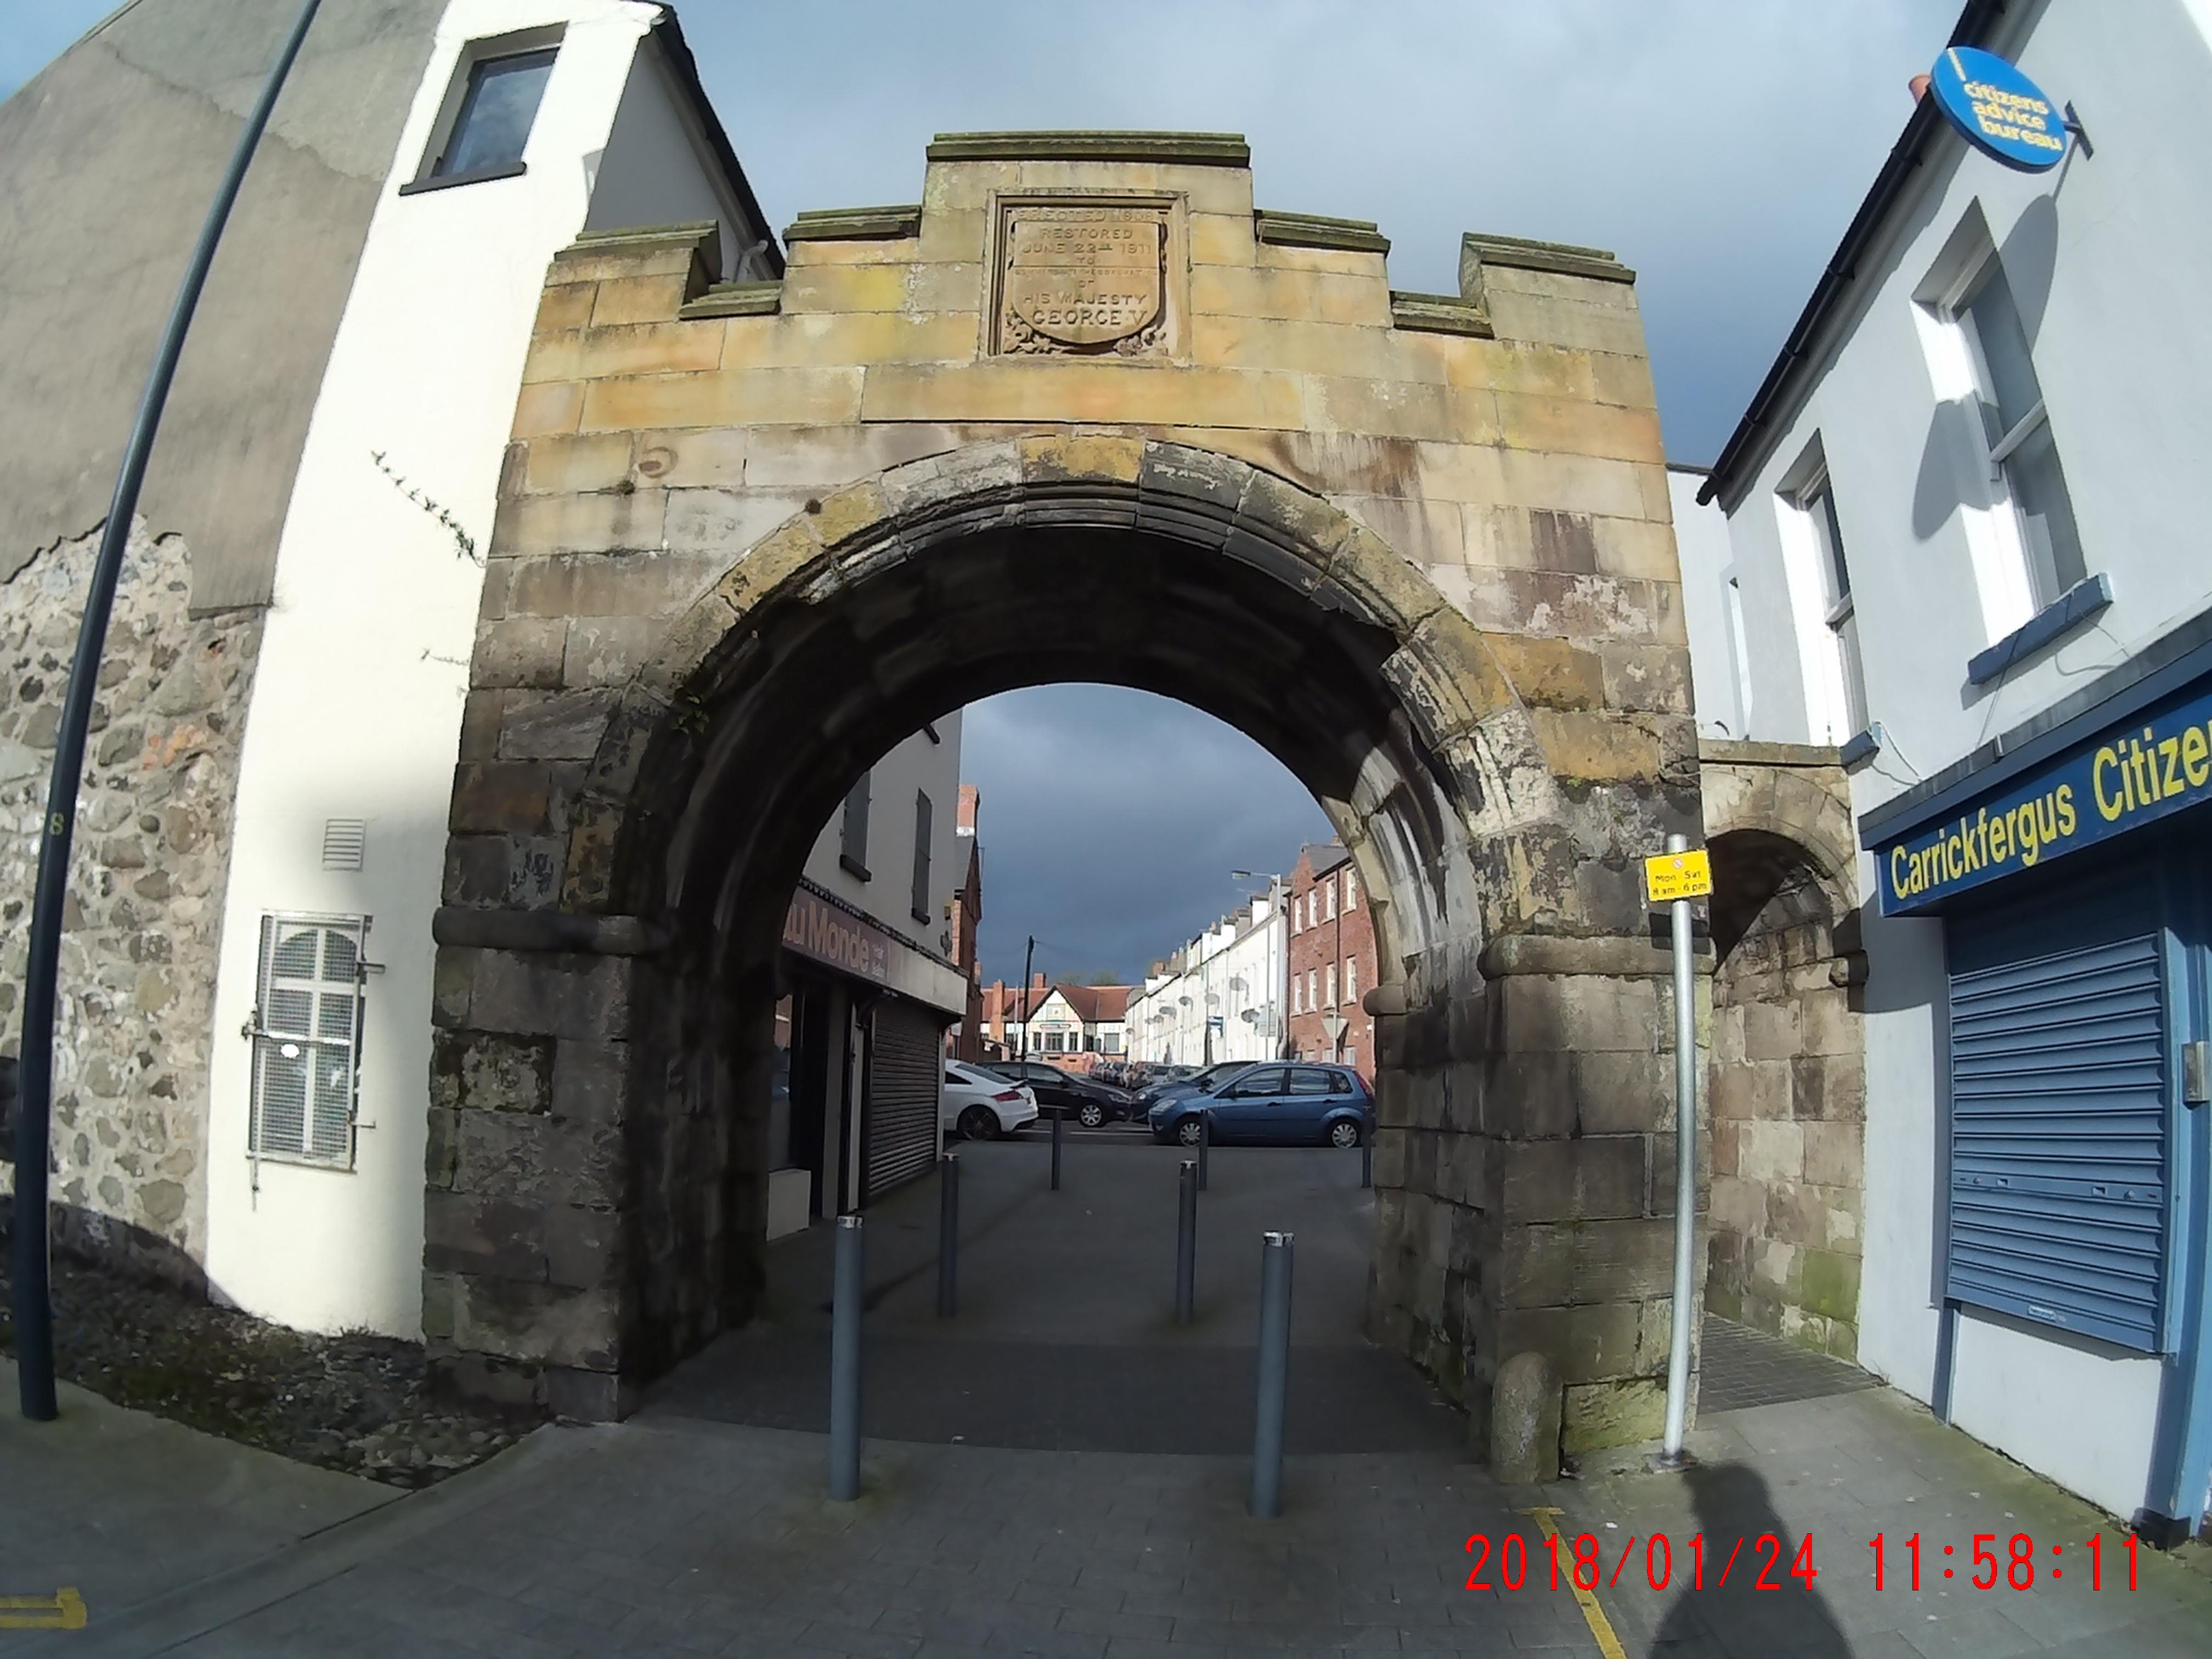 The North Gate Carrickfergus